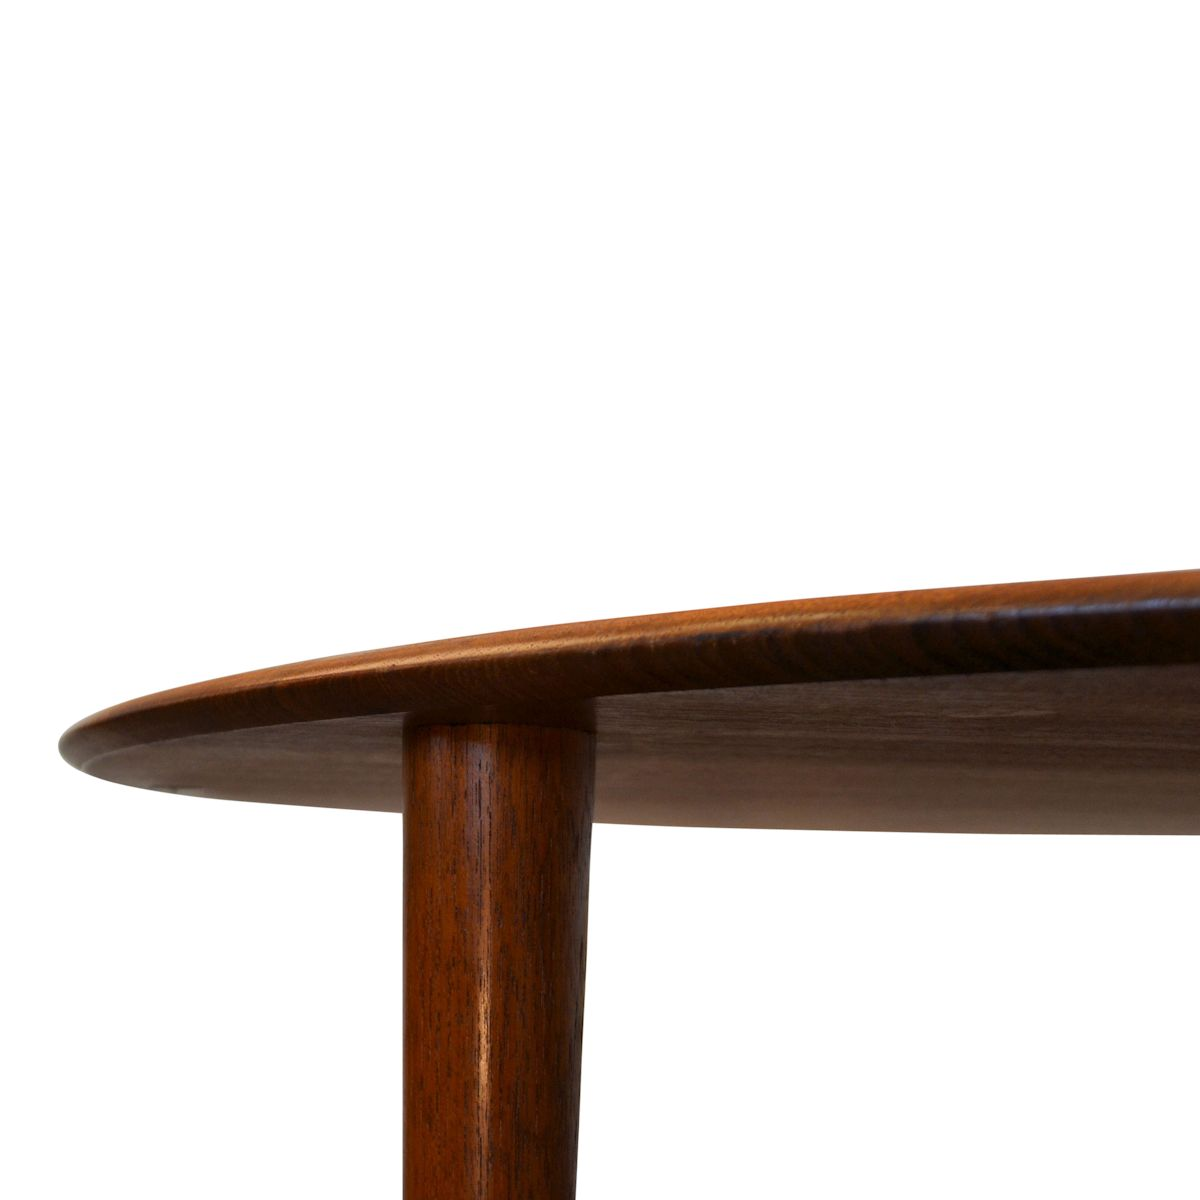 Orla Retro Coffee Table: Danish Modern Peter Hvidt & Orla Mølgaard Coffee Table